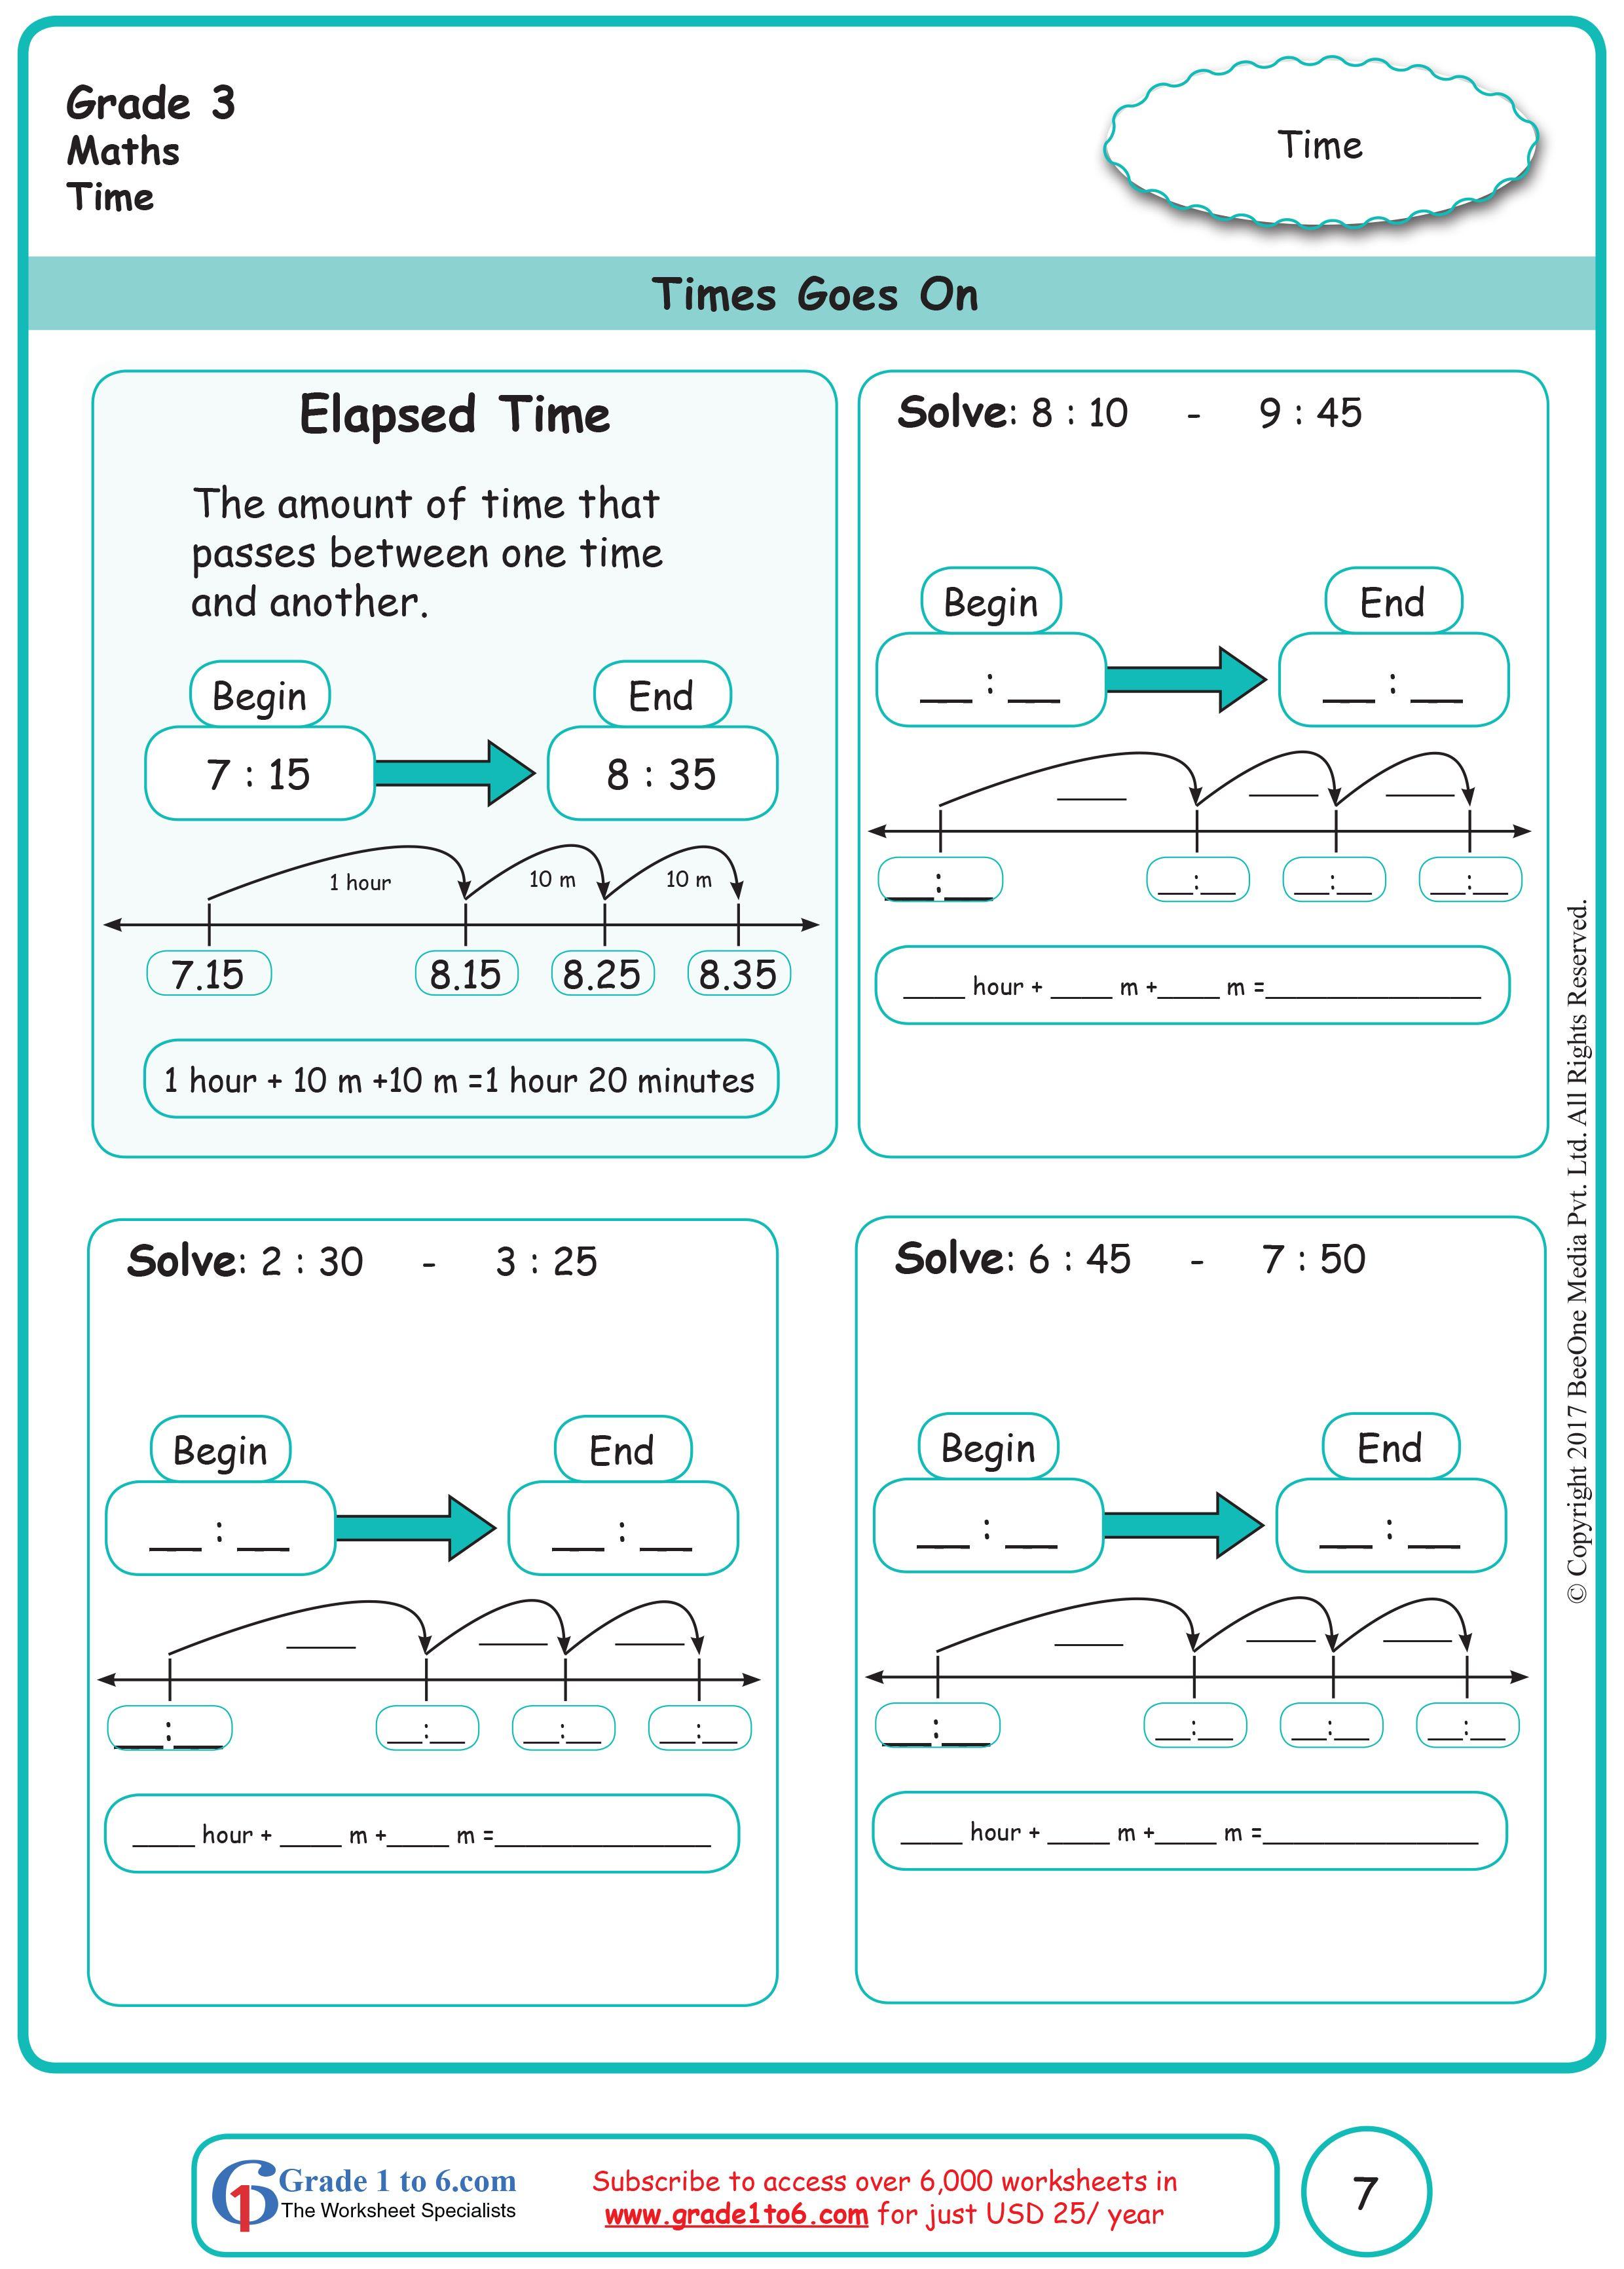 Pin Di Grade 3 Math Worksheets Pyp Cbse Icse Common Core